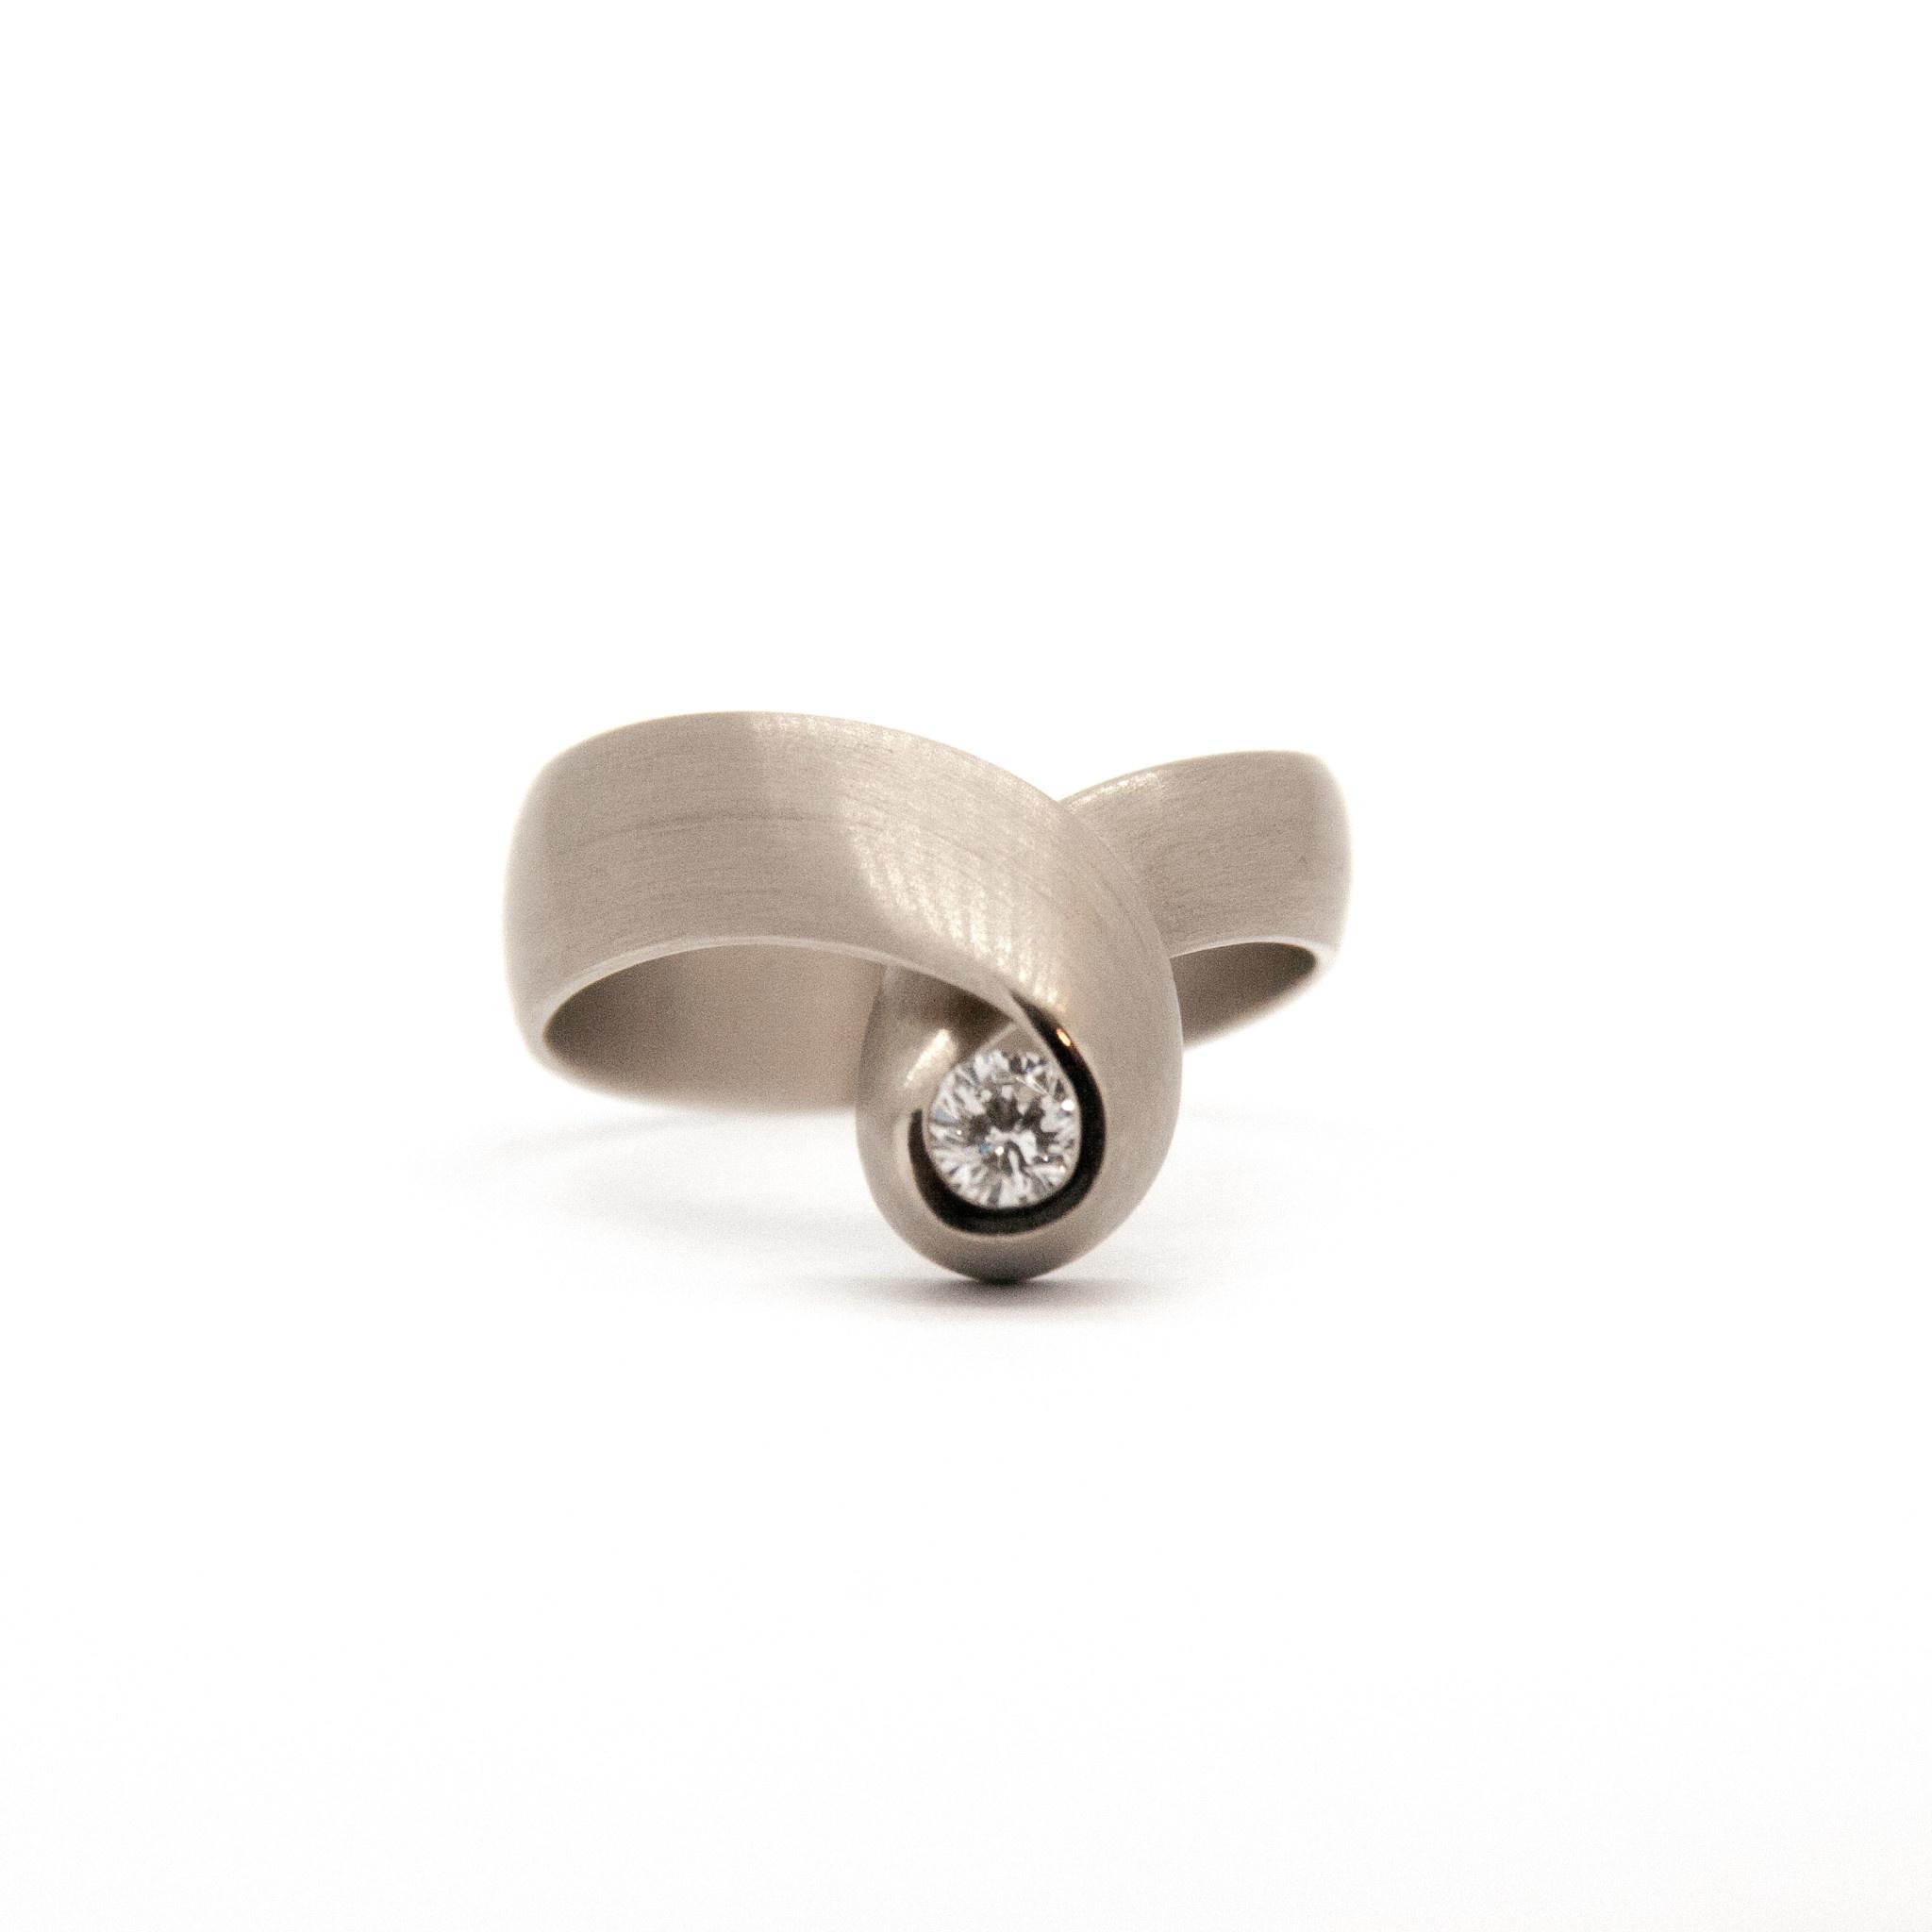 14k white gold ring size 56-9